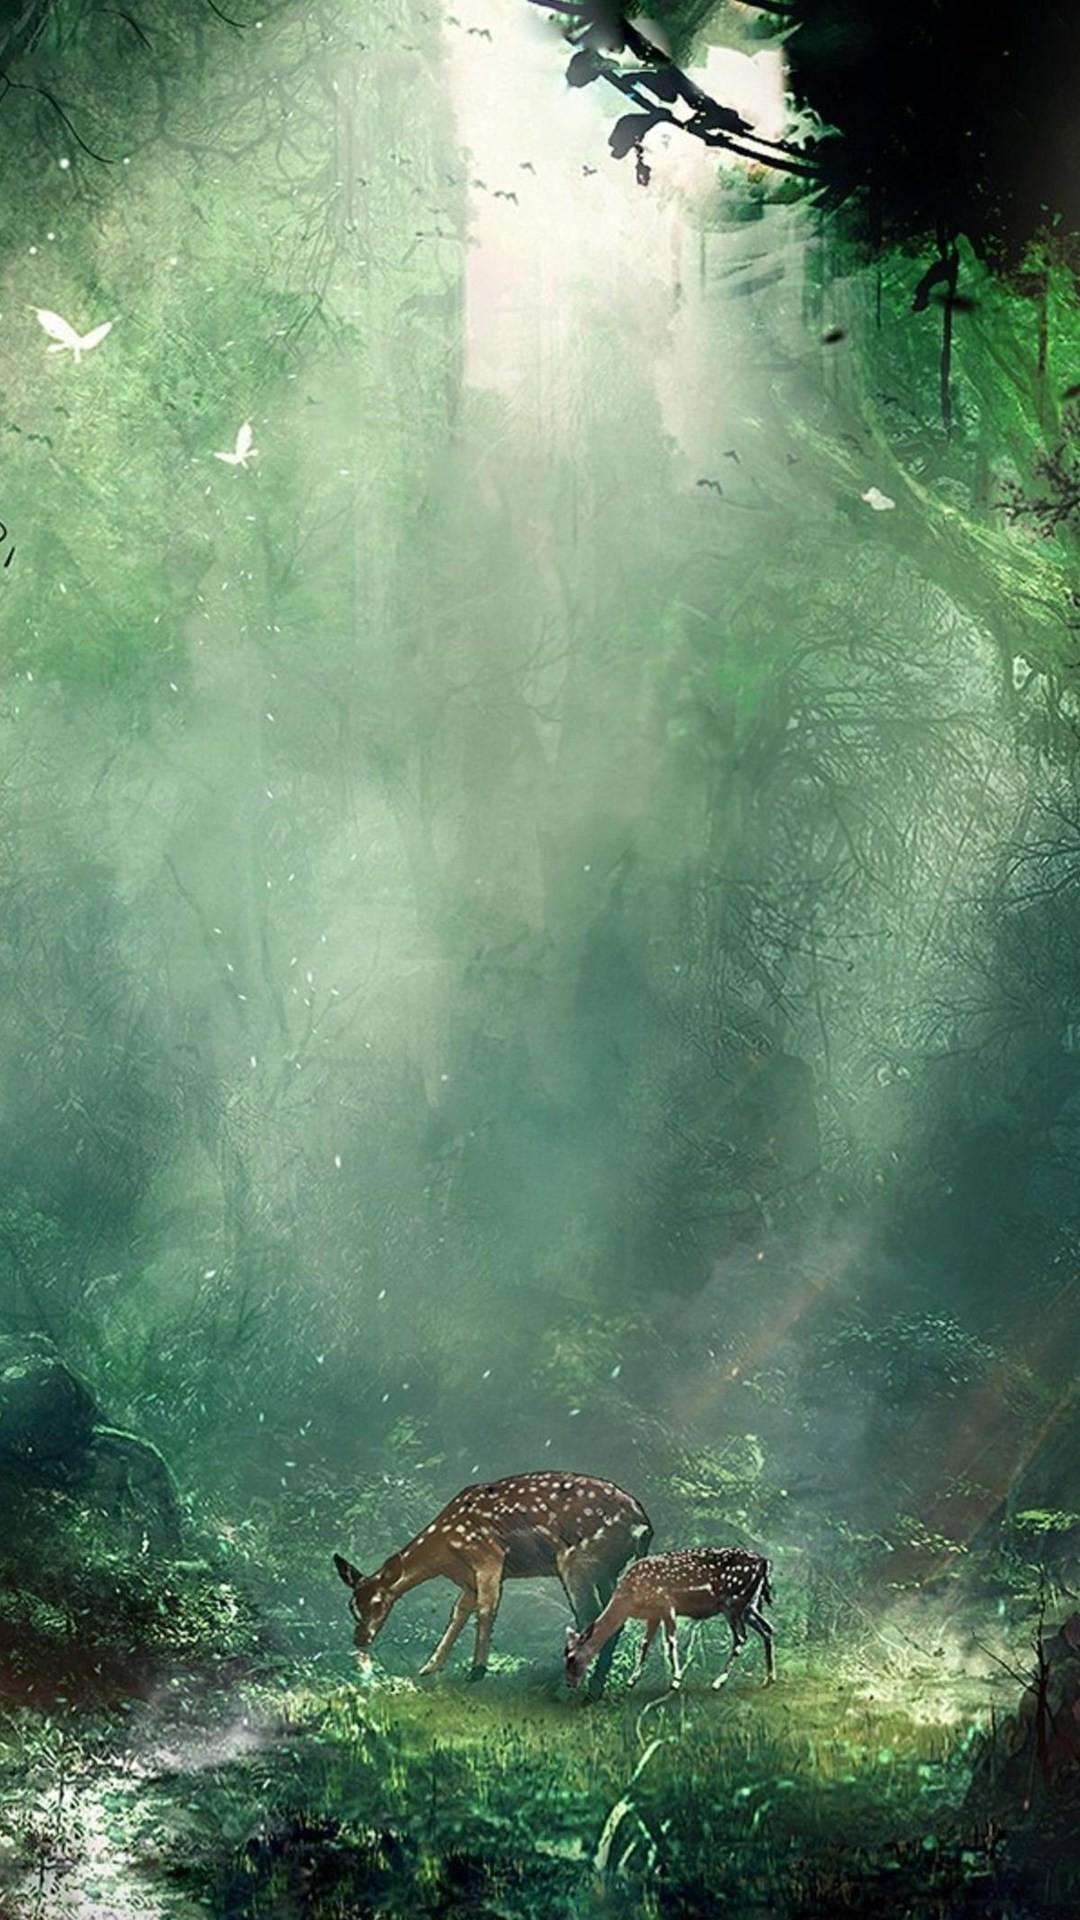 Res: 1080x1920, Bambi Wallpapers Wallpaper | HD Wallpapers | Pinterest | Wallpaper